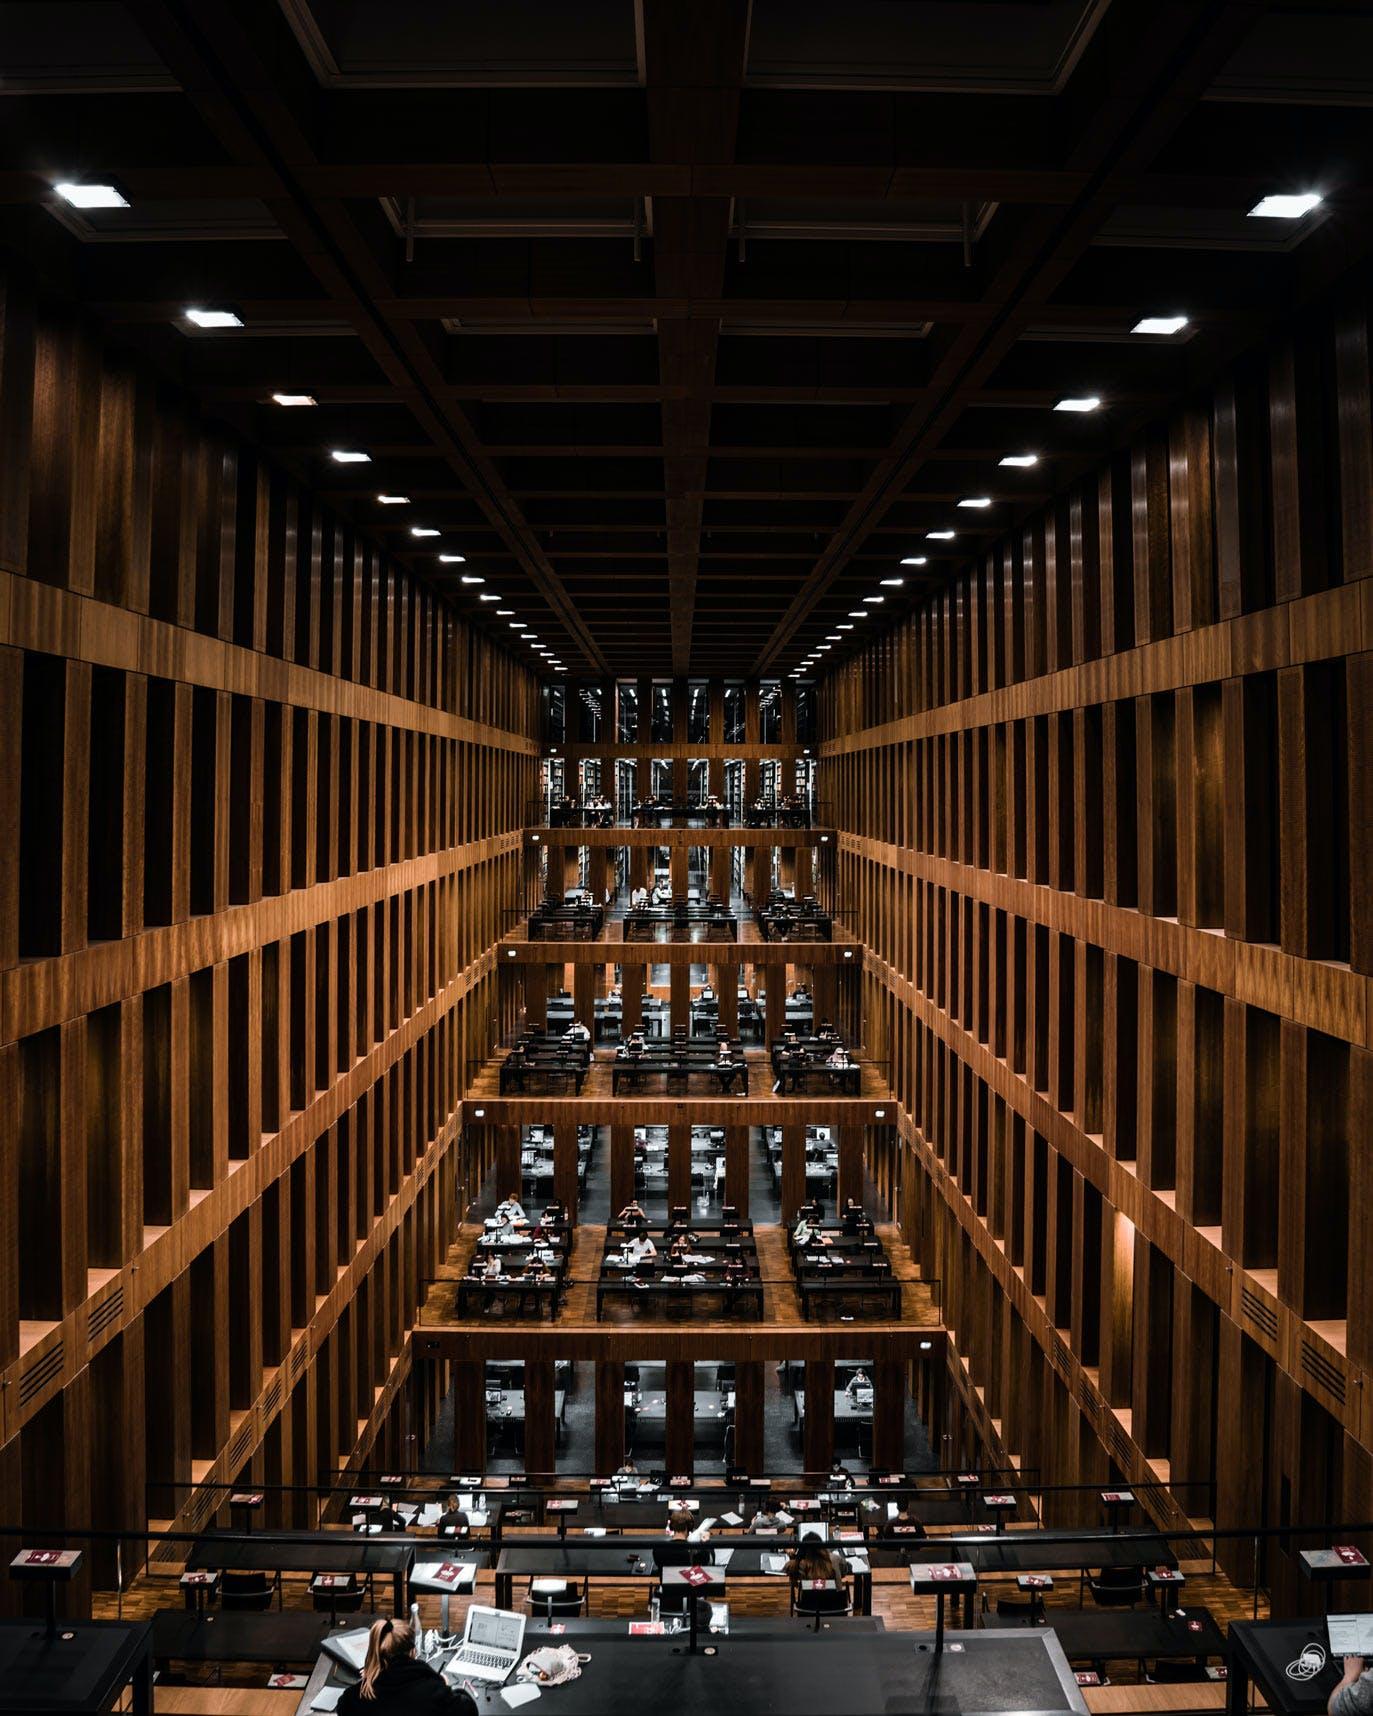 Study Space at Jacob-und-Wilhelm-Grimm Zentrum University Library